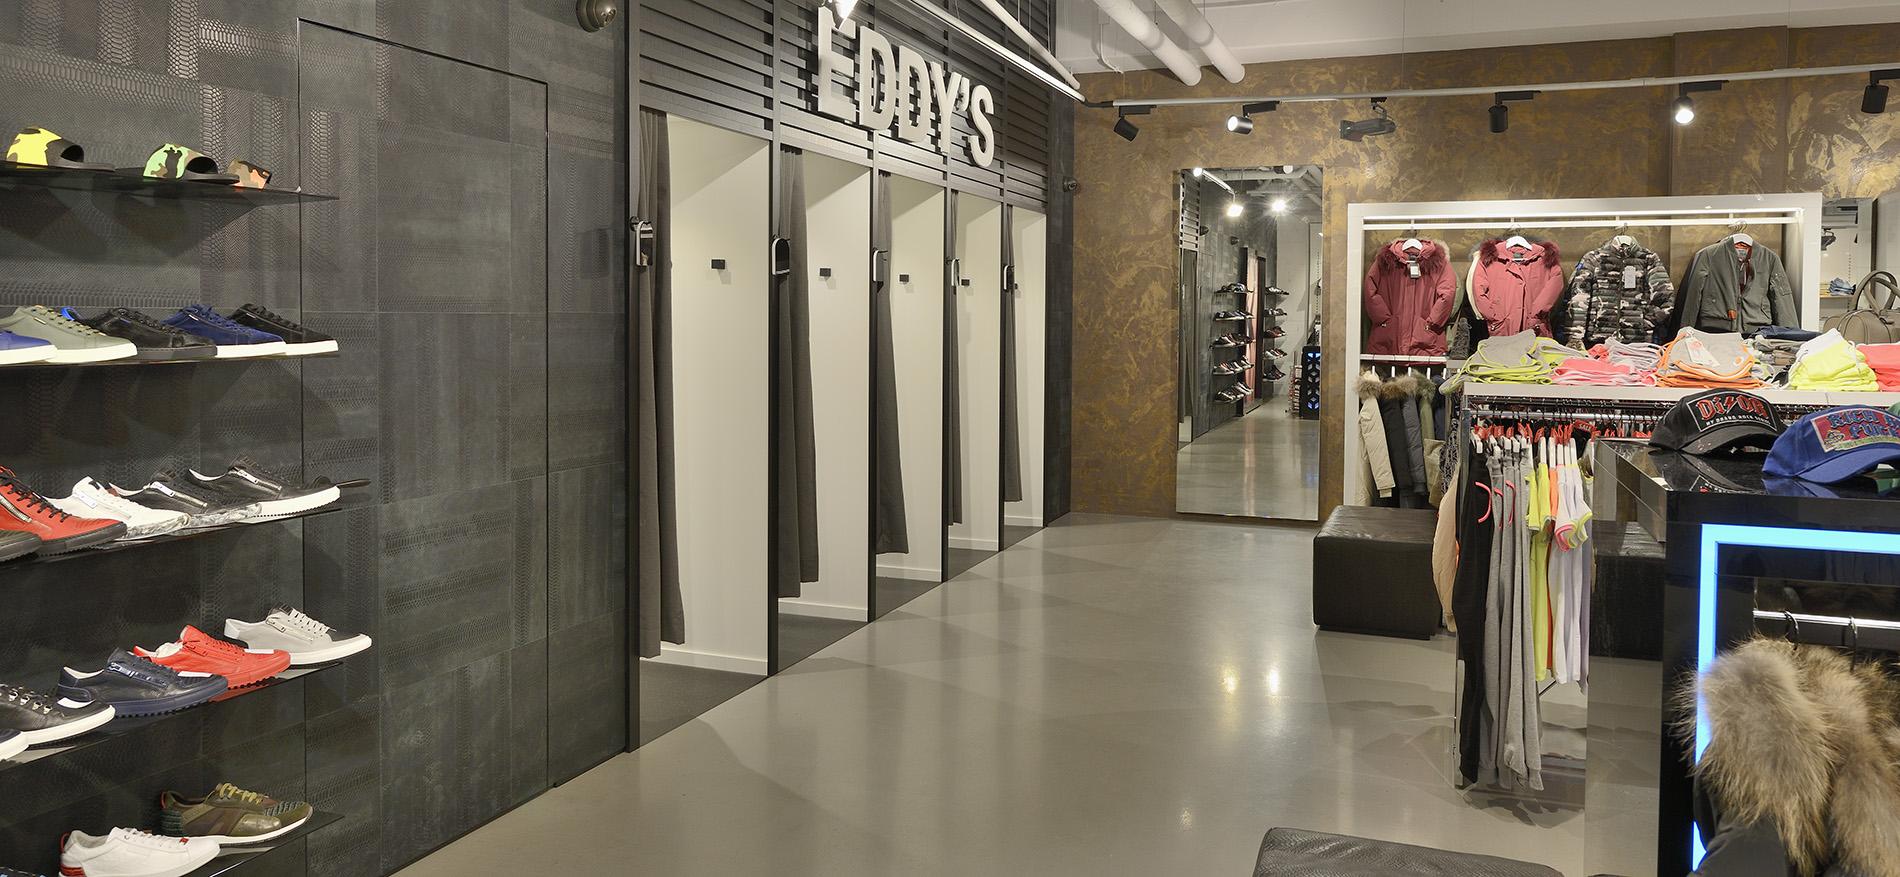 eddy 39 s mode winkelbouw kleding wsb interieurbouw. Black Bedroom Furniture Sets. Home Design Ideas